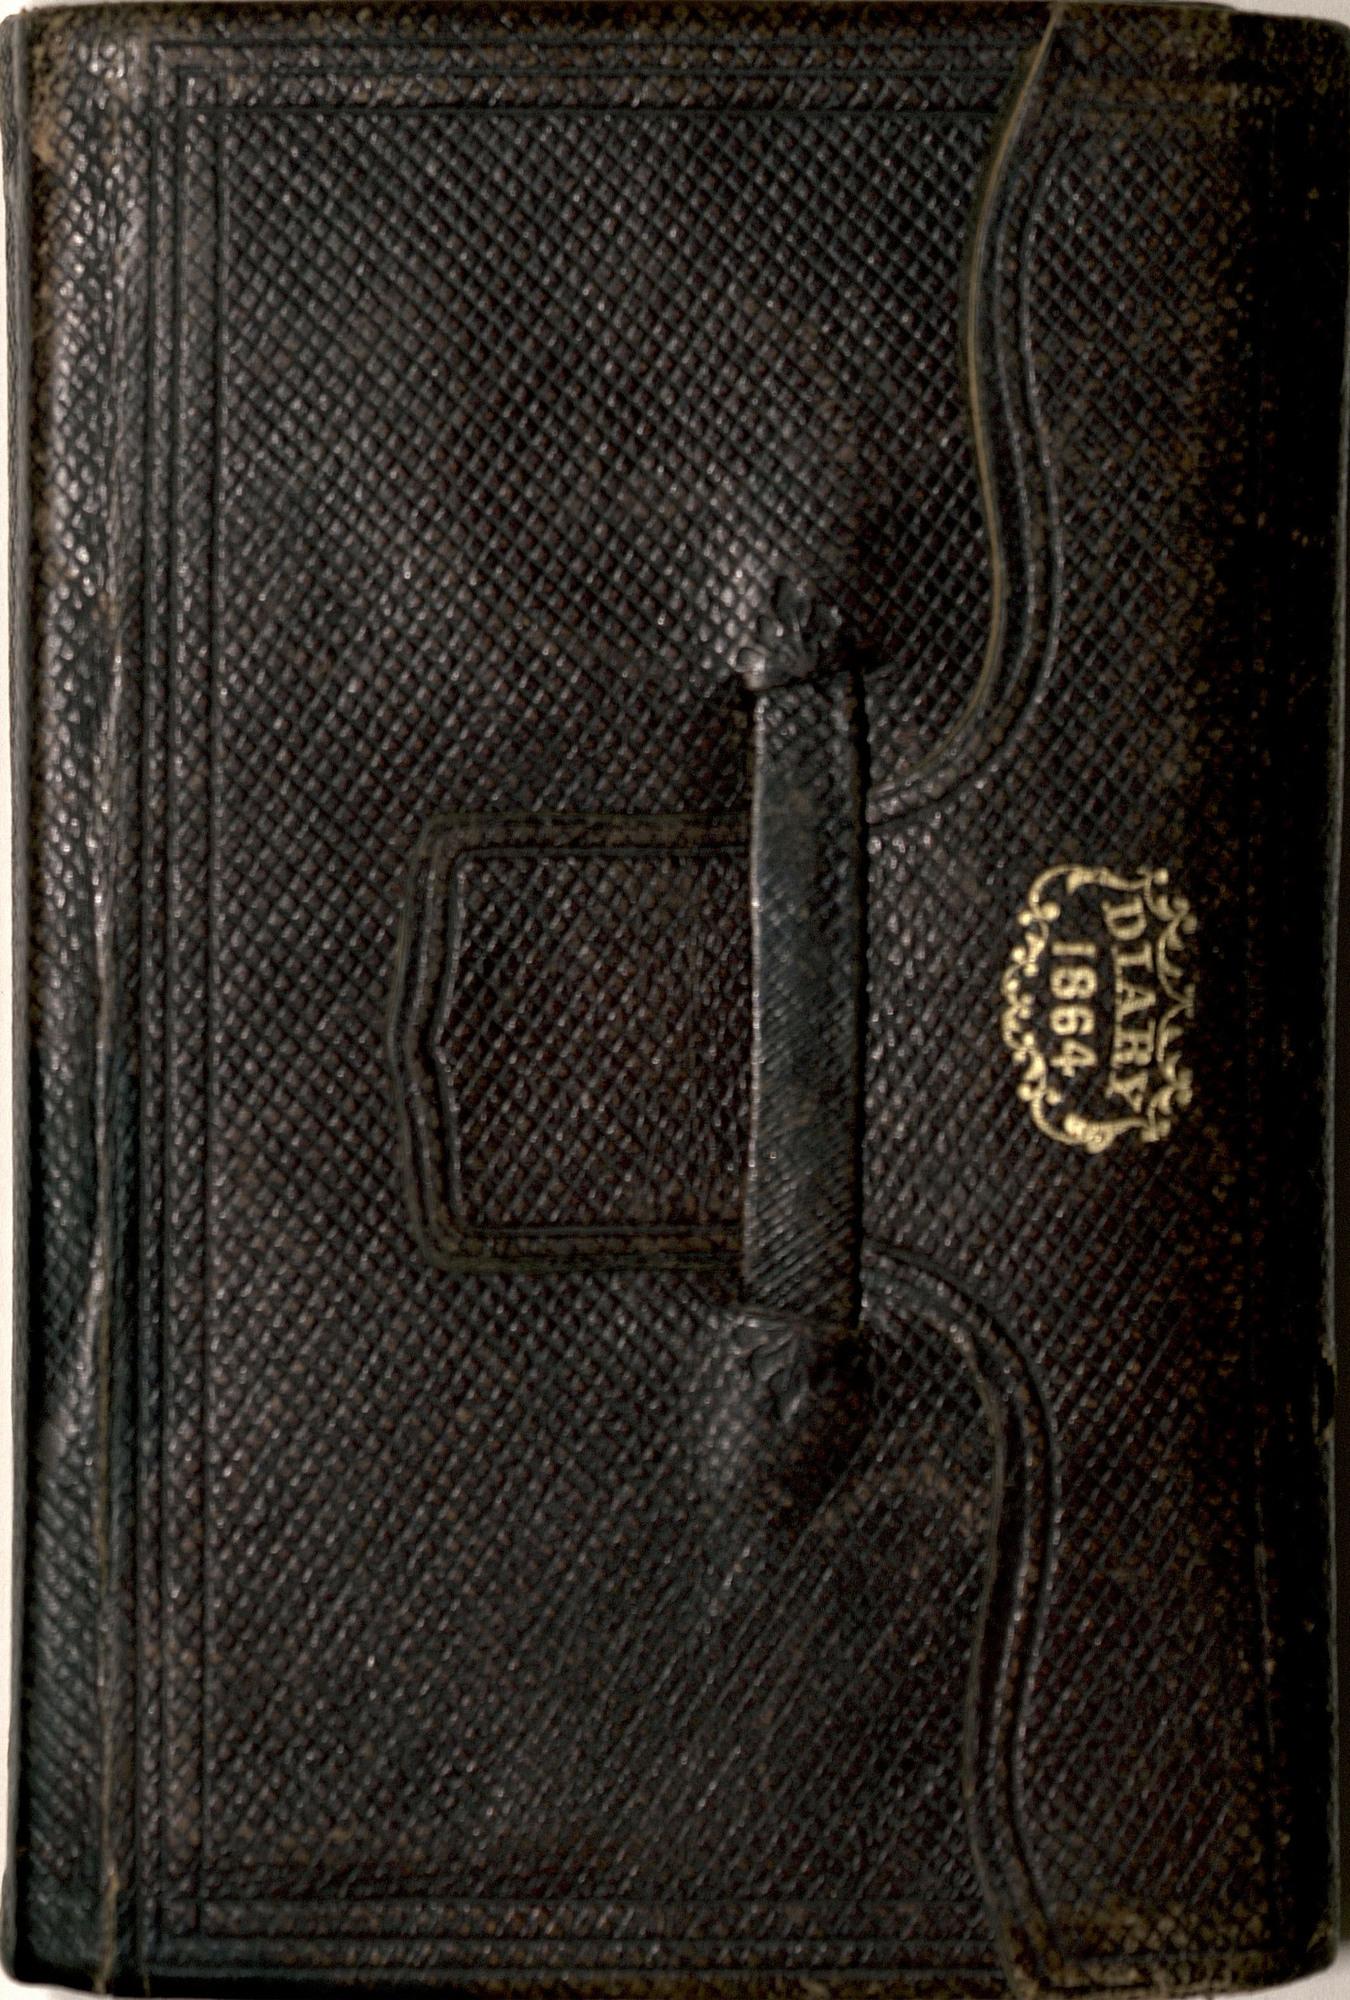 Ms2008-044_MayburyJohnR_Diary_1864_frontcover.jpg